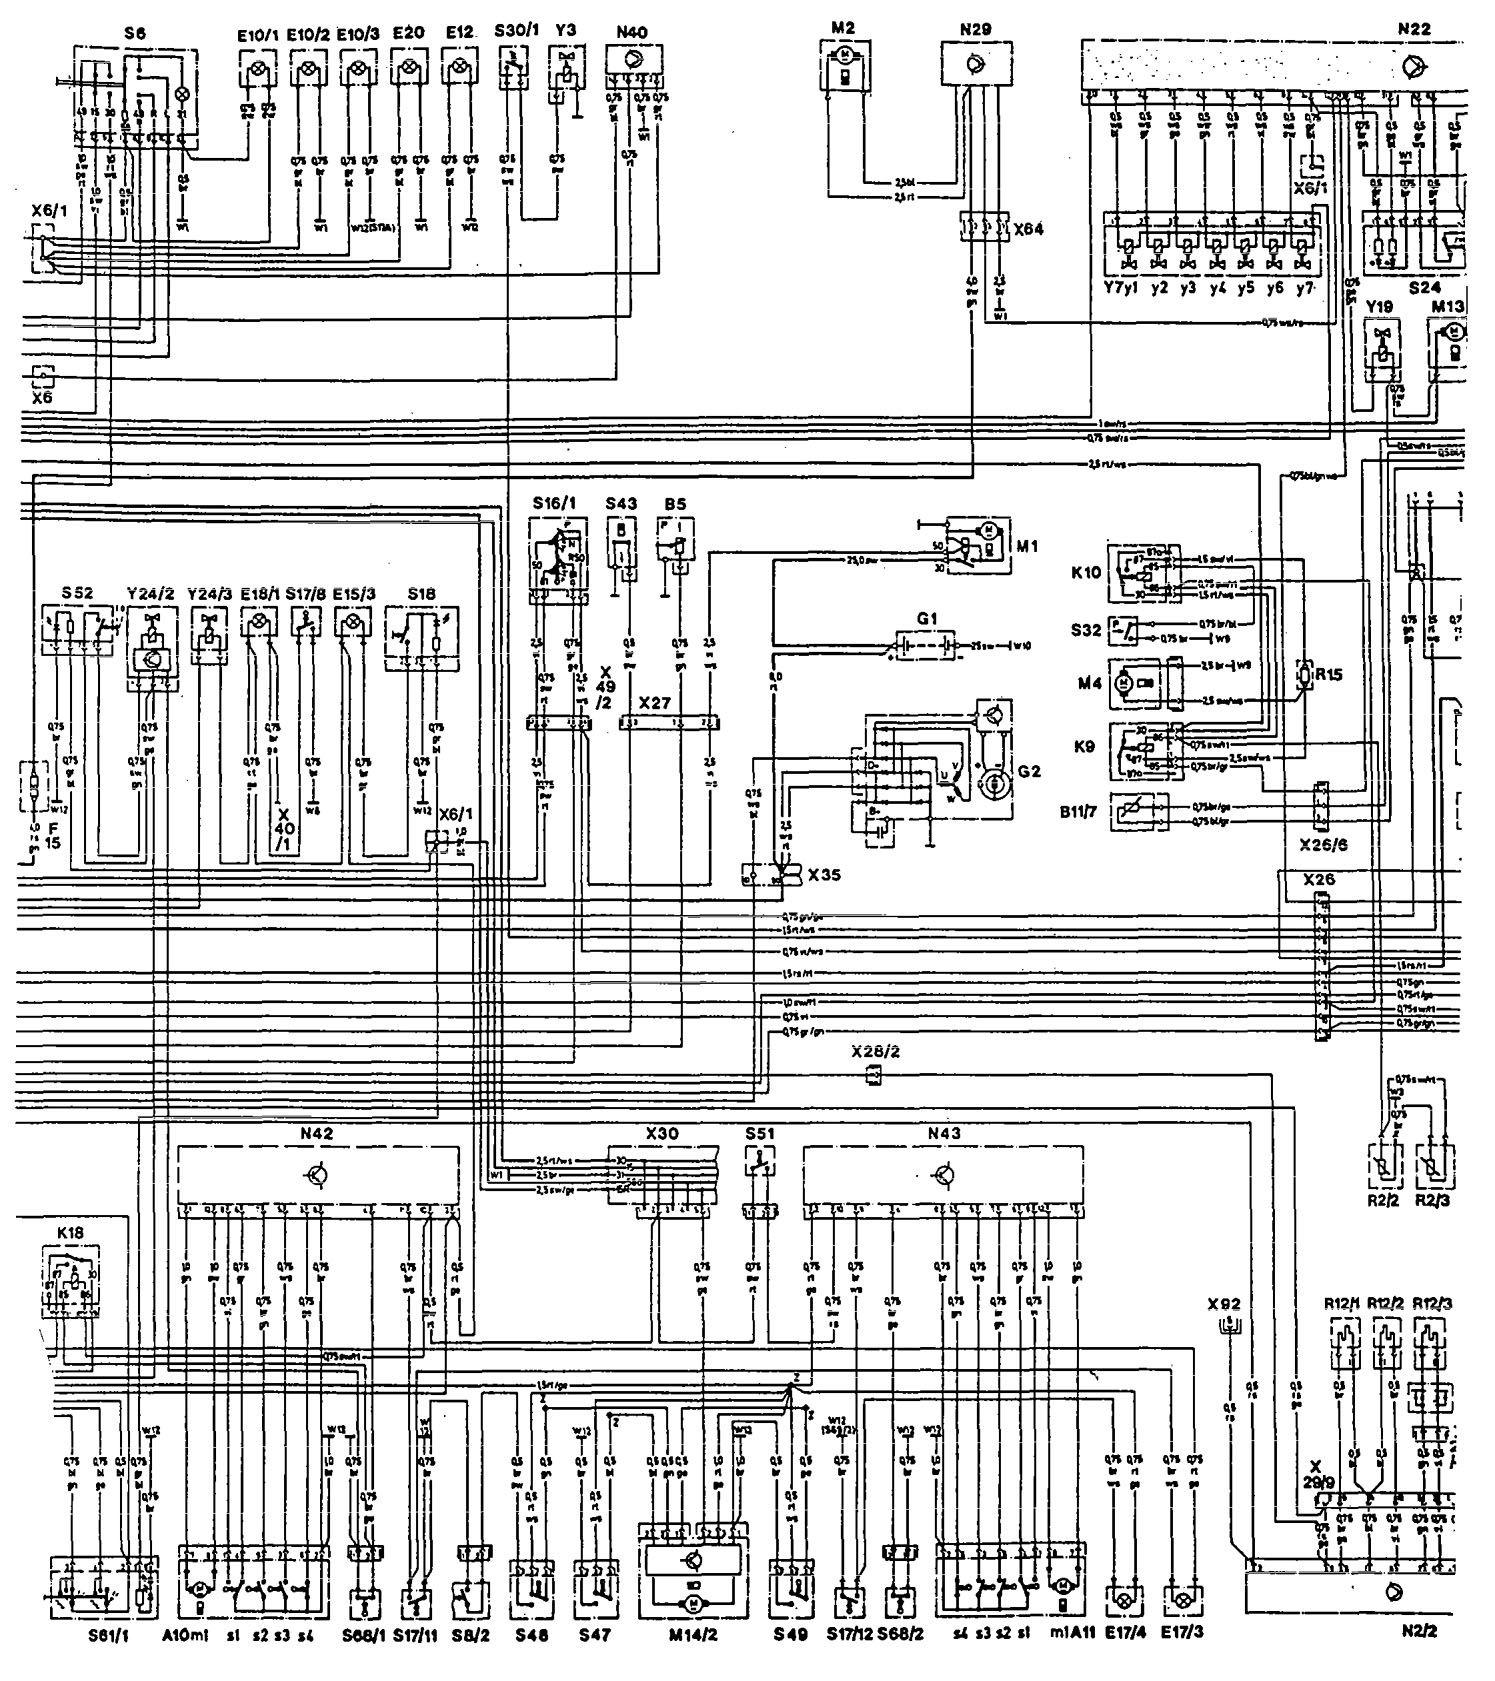 Beautiful Mercedes 240d Wiring Diagram Ideas Electrical ...